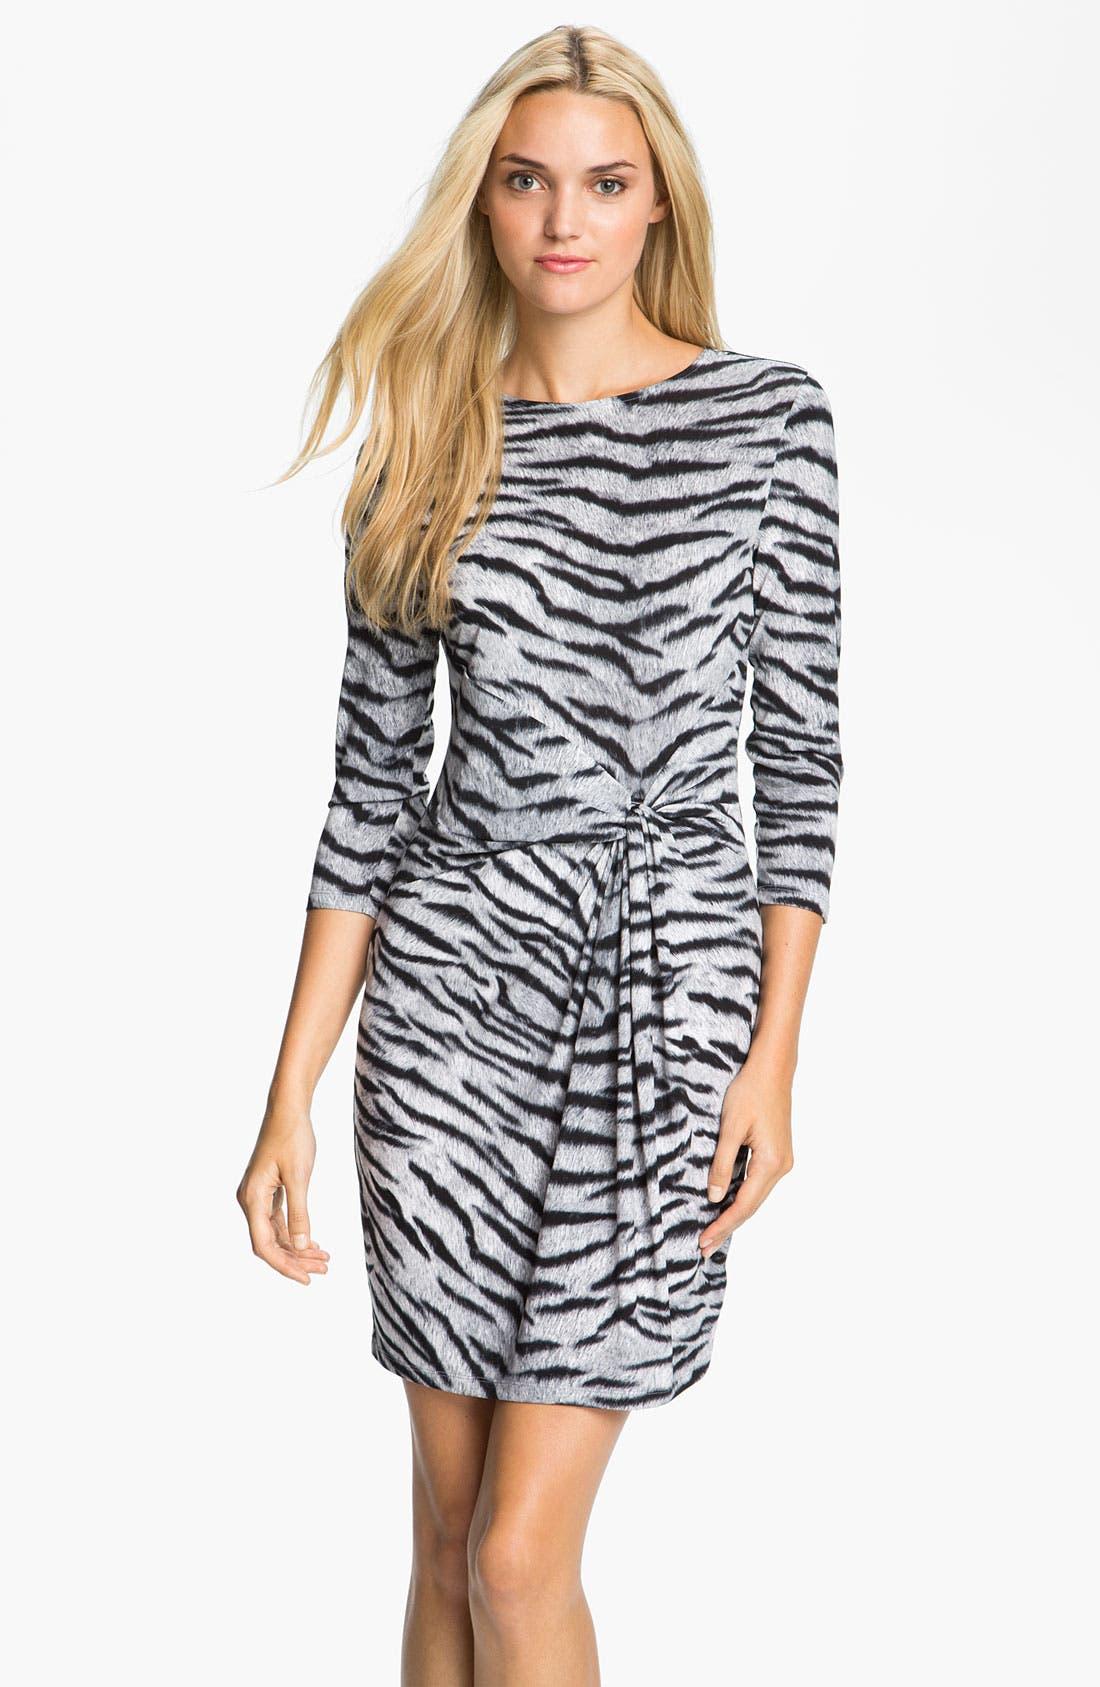 Alternate Image 1 Selected - MICHAEL Michael Kors Knot Front Dress (Petite)